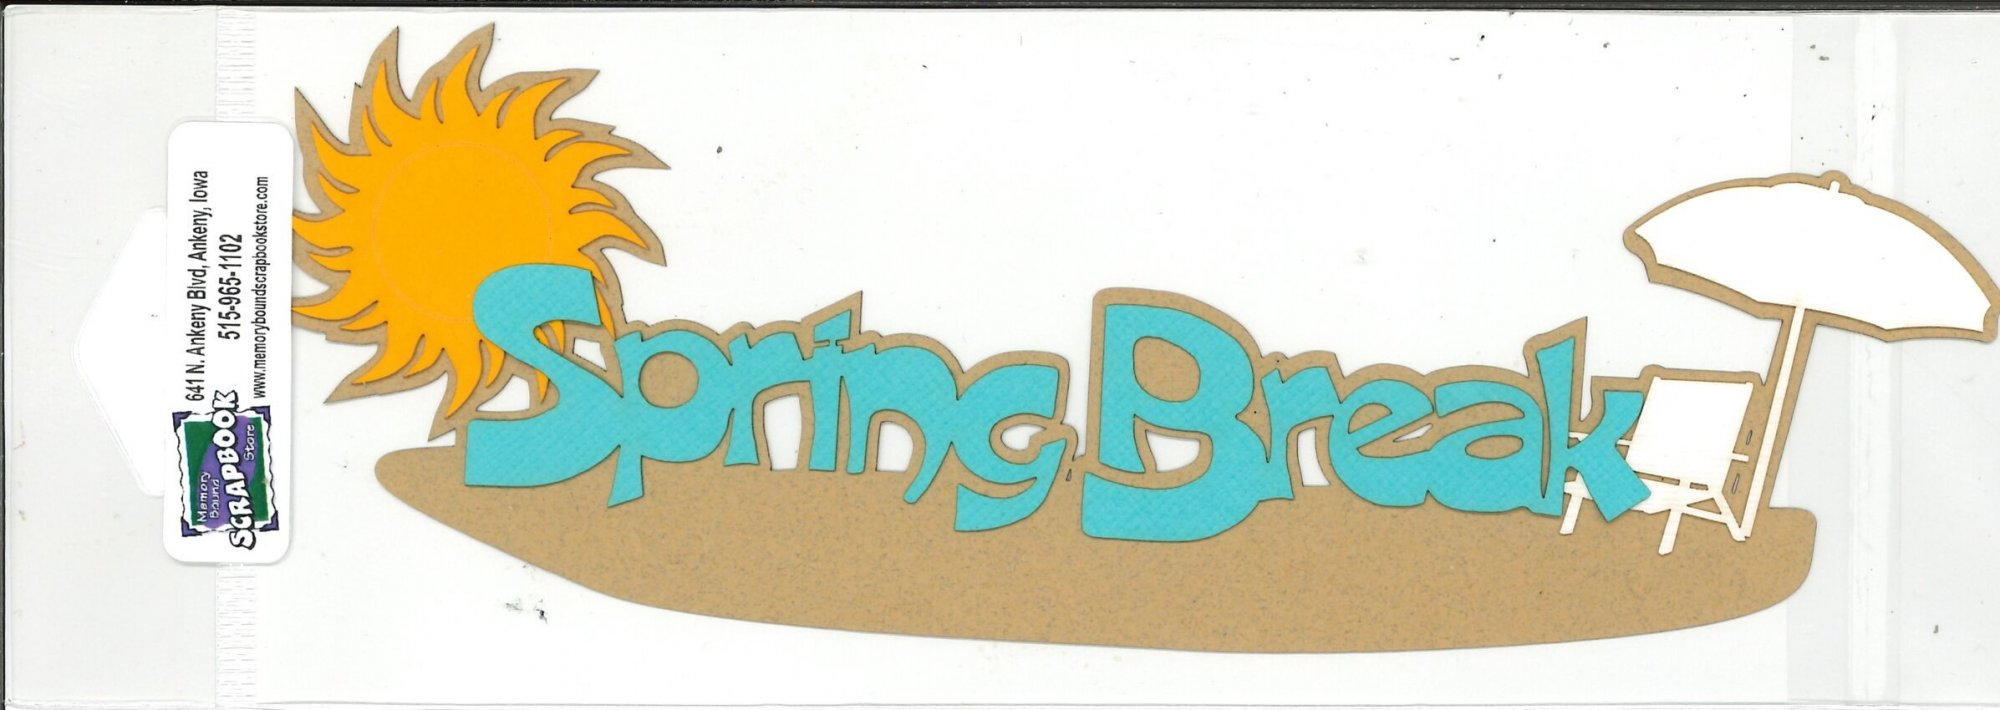 DIECUT - SPRING BREAK W/UMBRELLA